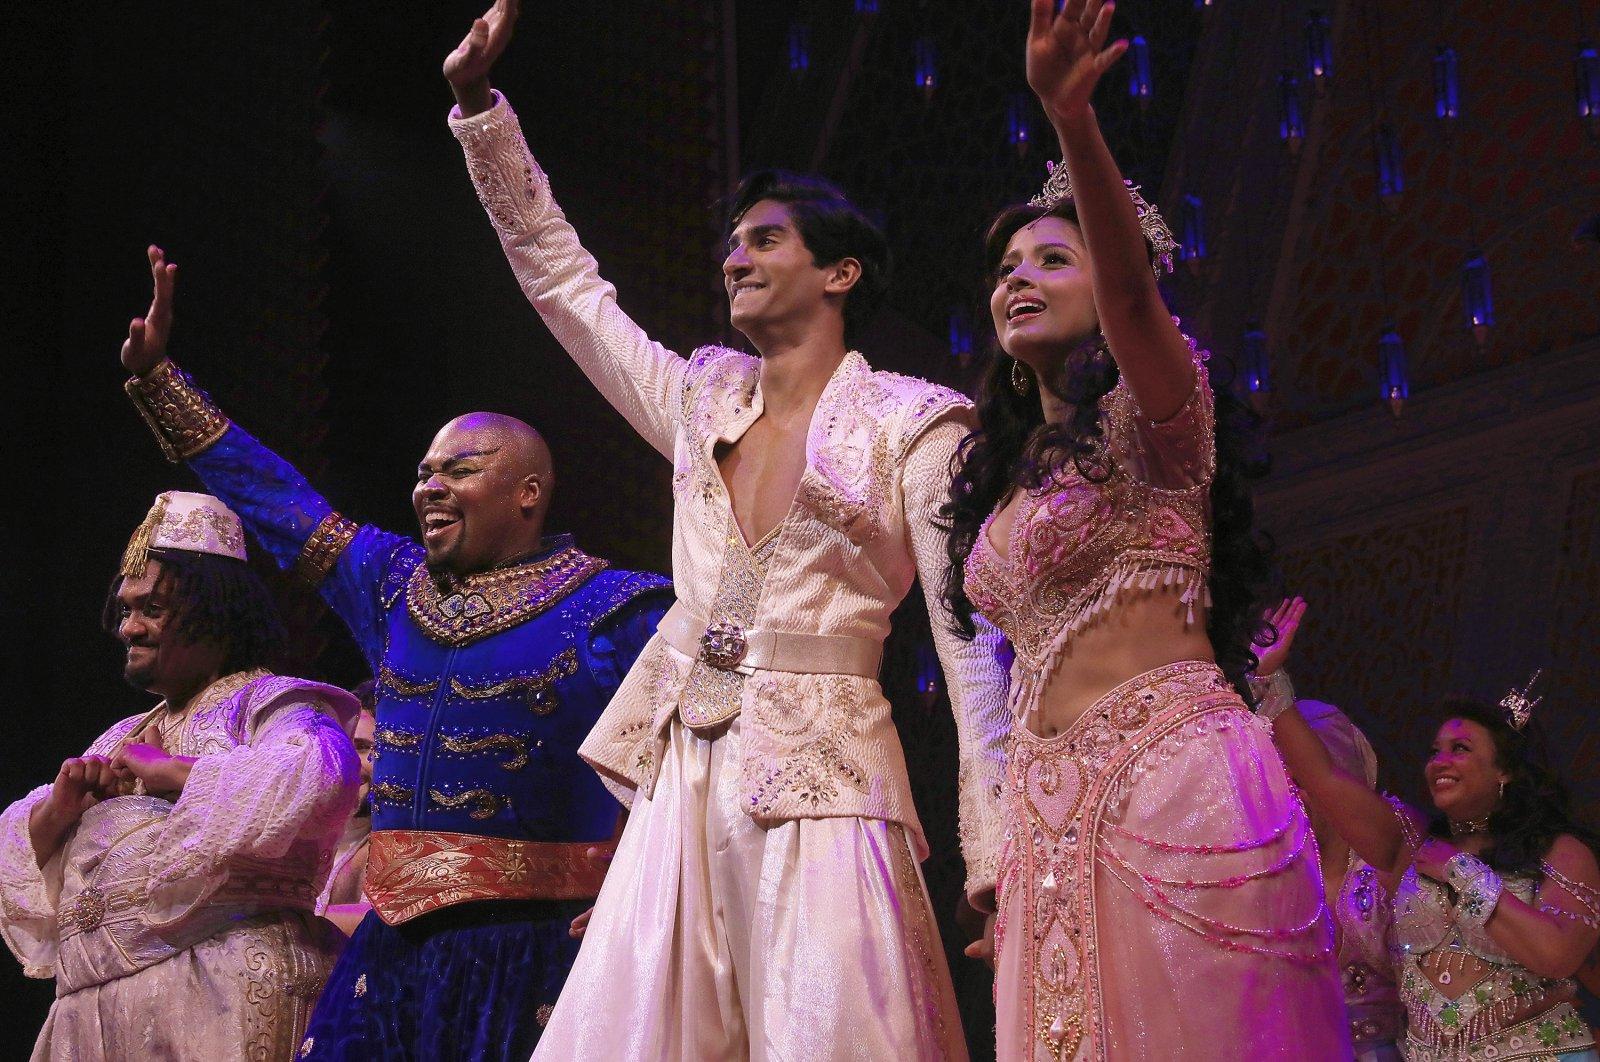 "Michael James Scott (C-L) as Genie, Michael Maliakel (C) as Aladdin, and Shoba Narayan (R) as Jasmine after a performance of the Broadway musical ""Aladdin"" in New York, U.S., Sept. 28, 2021. (Disney Theatrical Productions via AP)"